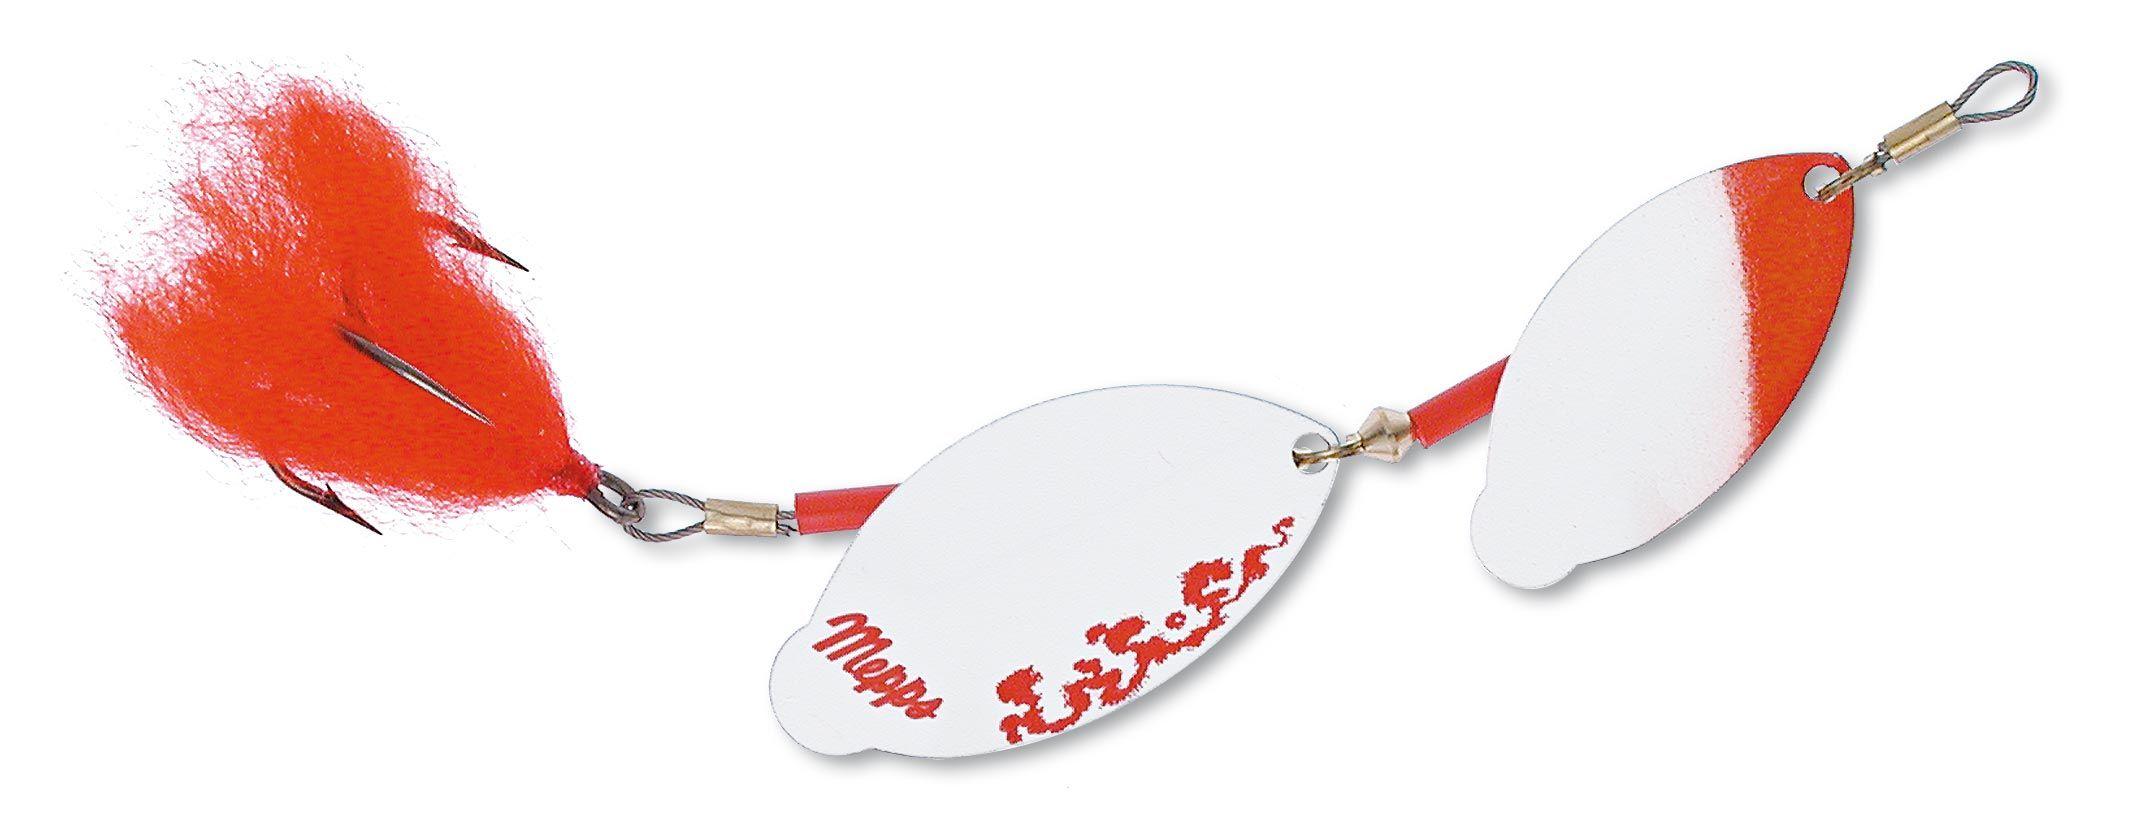 Mepps tandem brochet - 15 cm - wit/rood